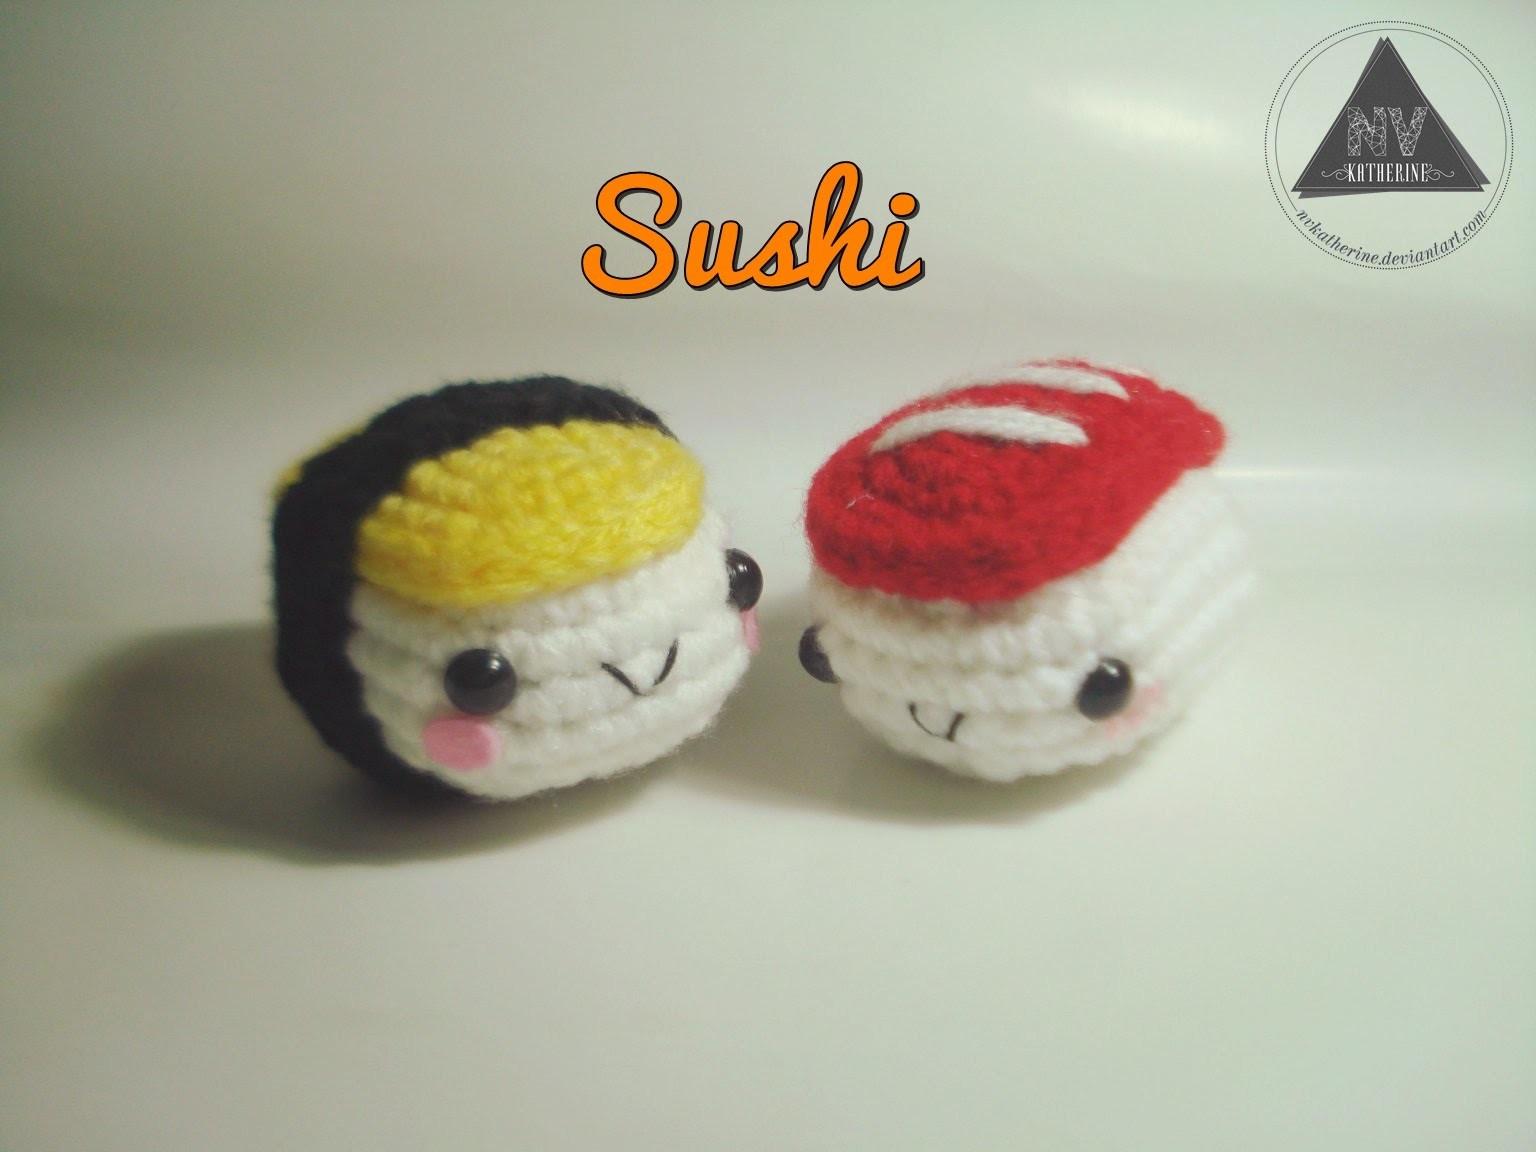 How To Crochet Sushi Amigurumi [FULL TUTORIAL]